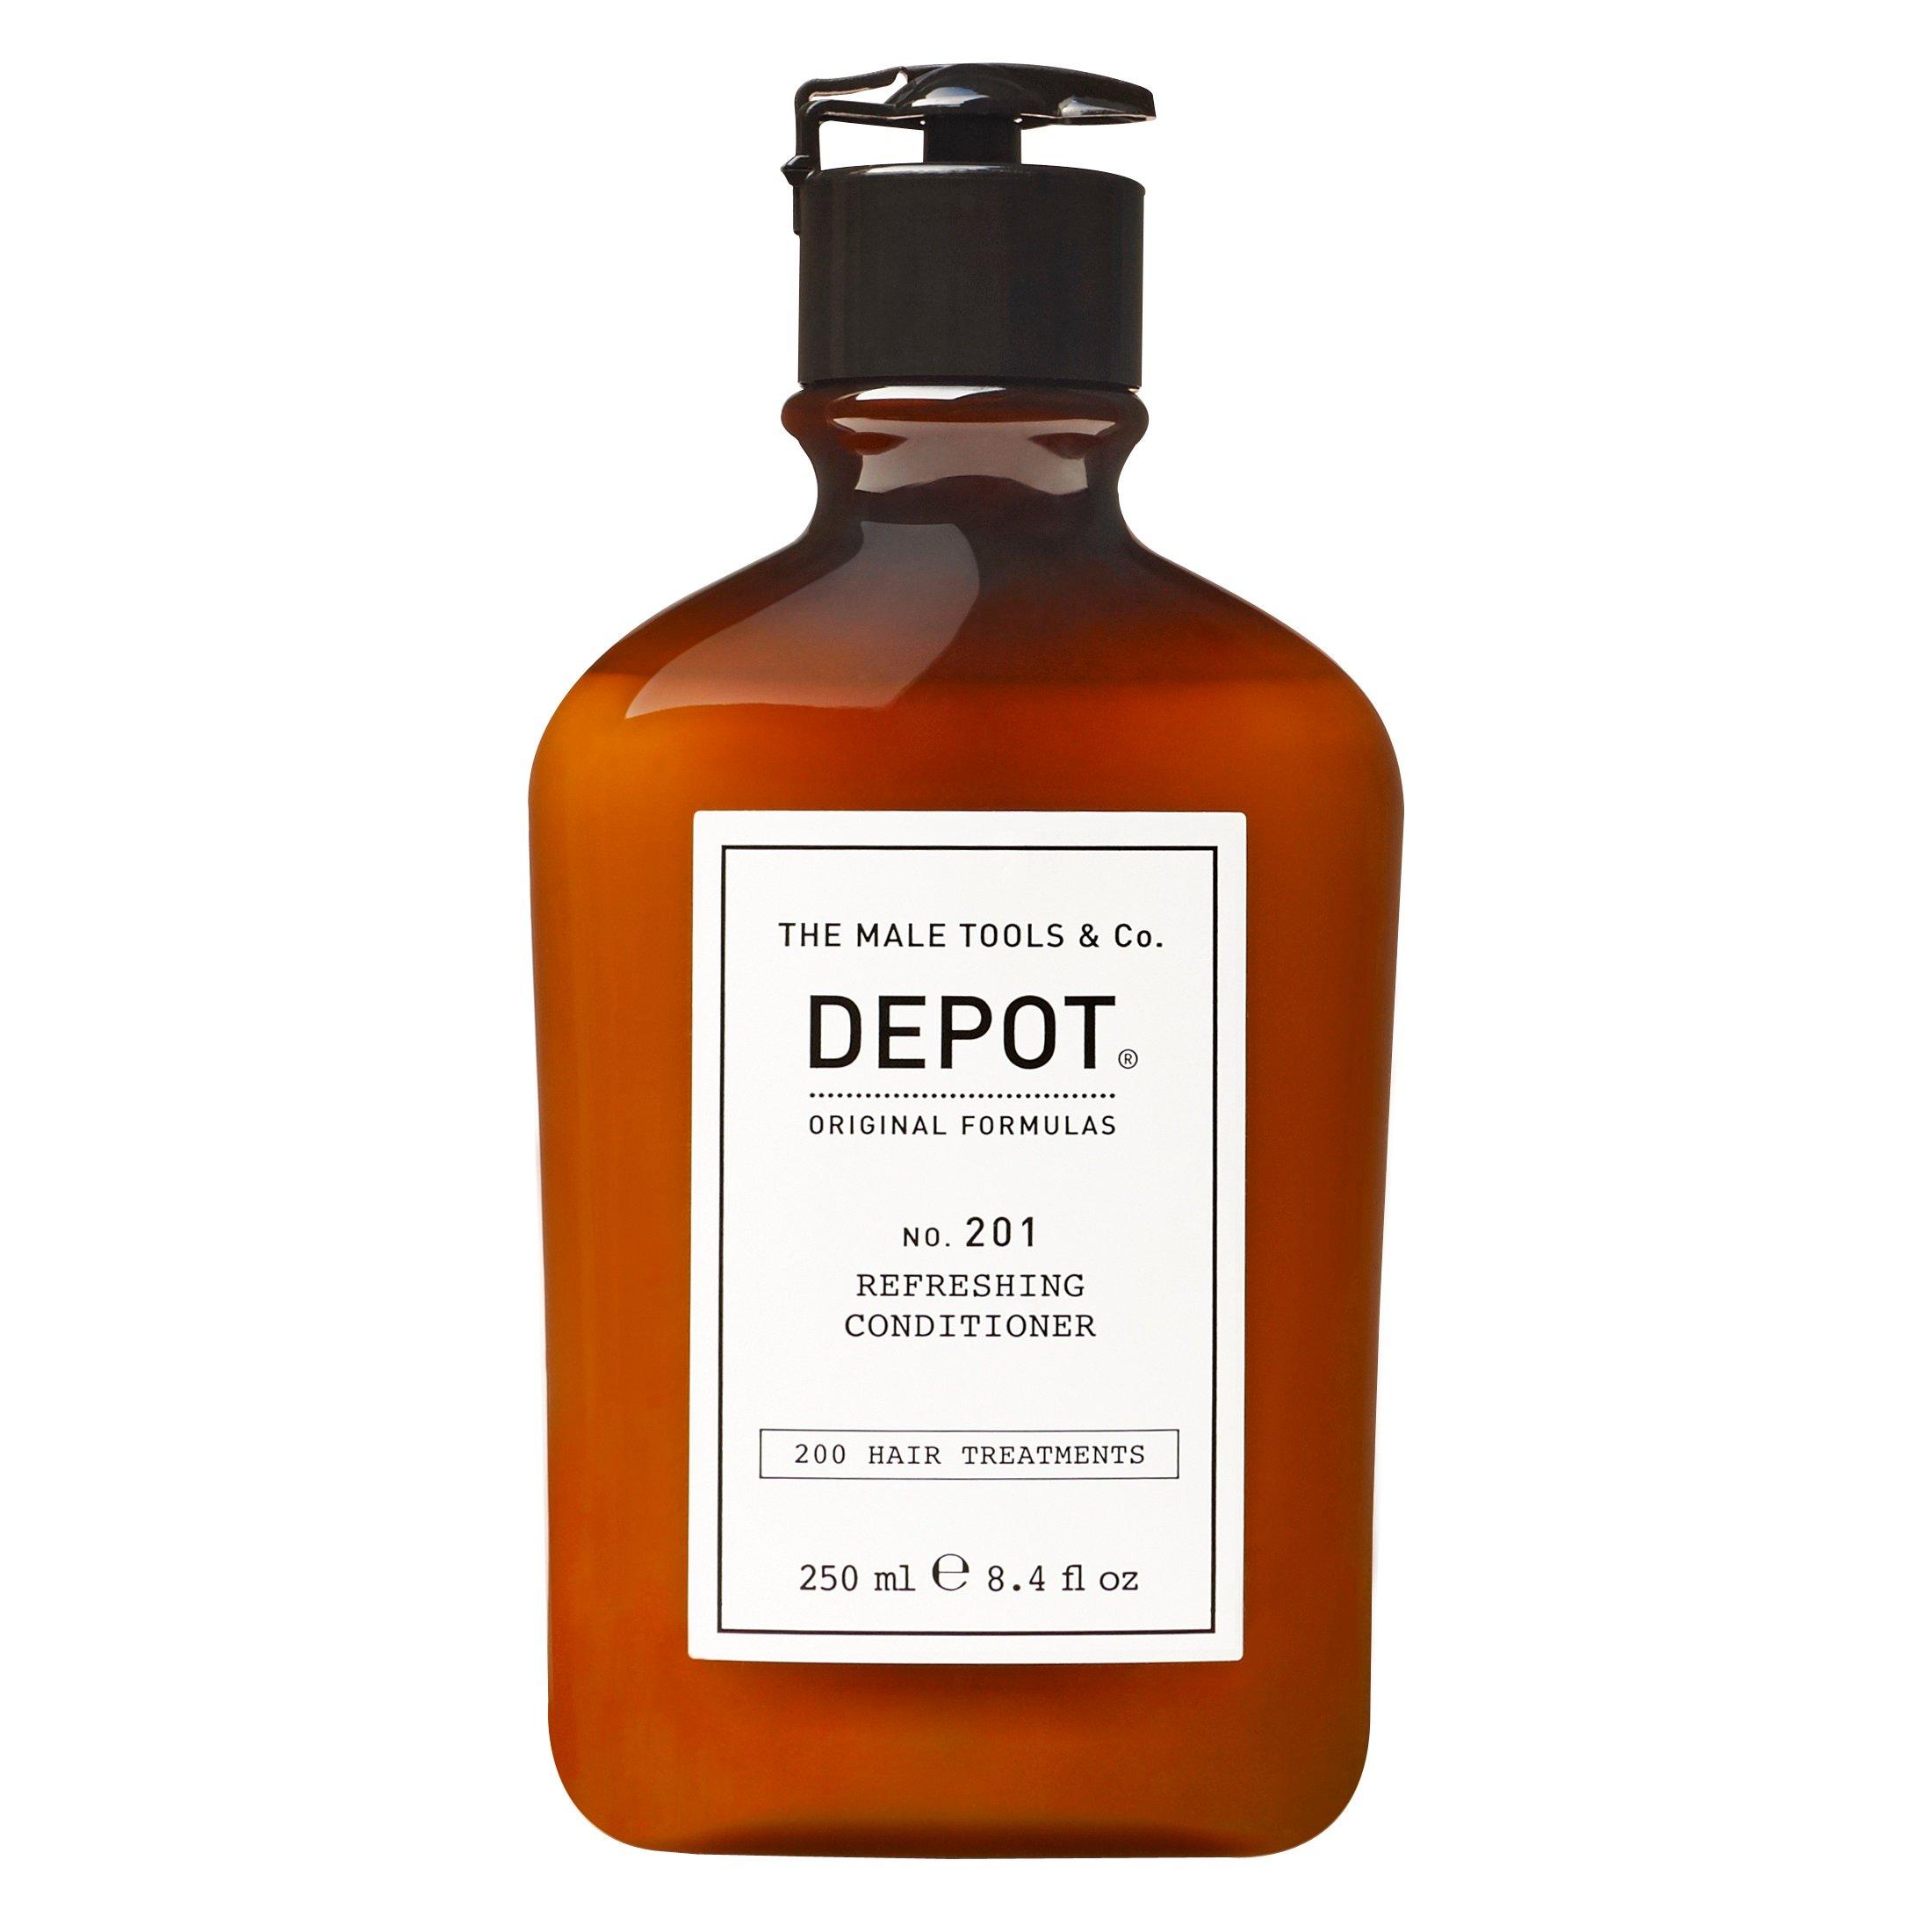 Depot - No. 201 Refreshing Conditioner 250 ml